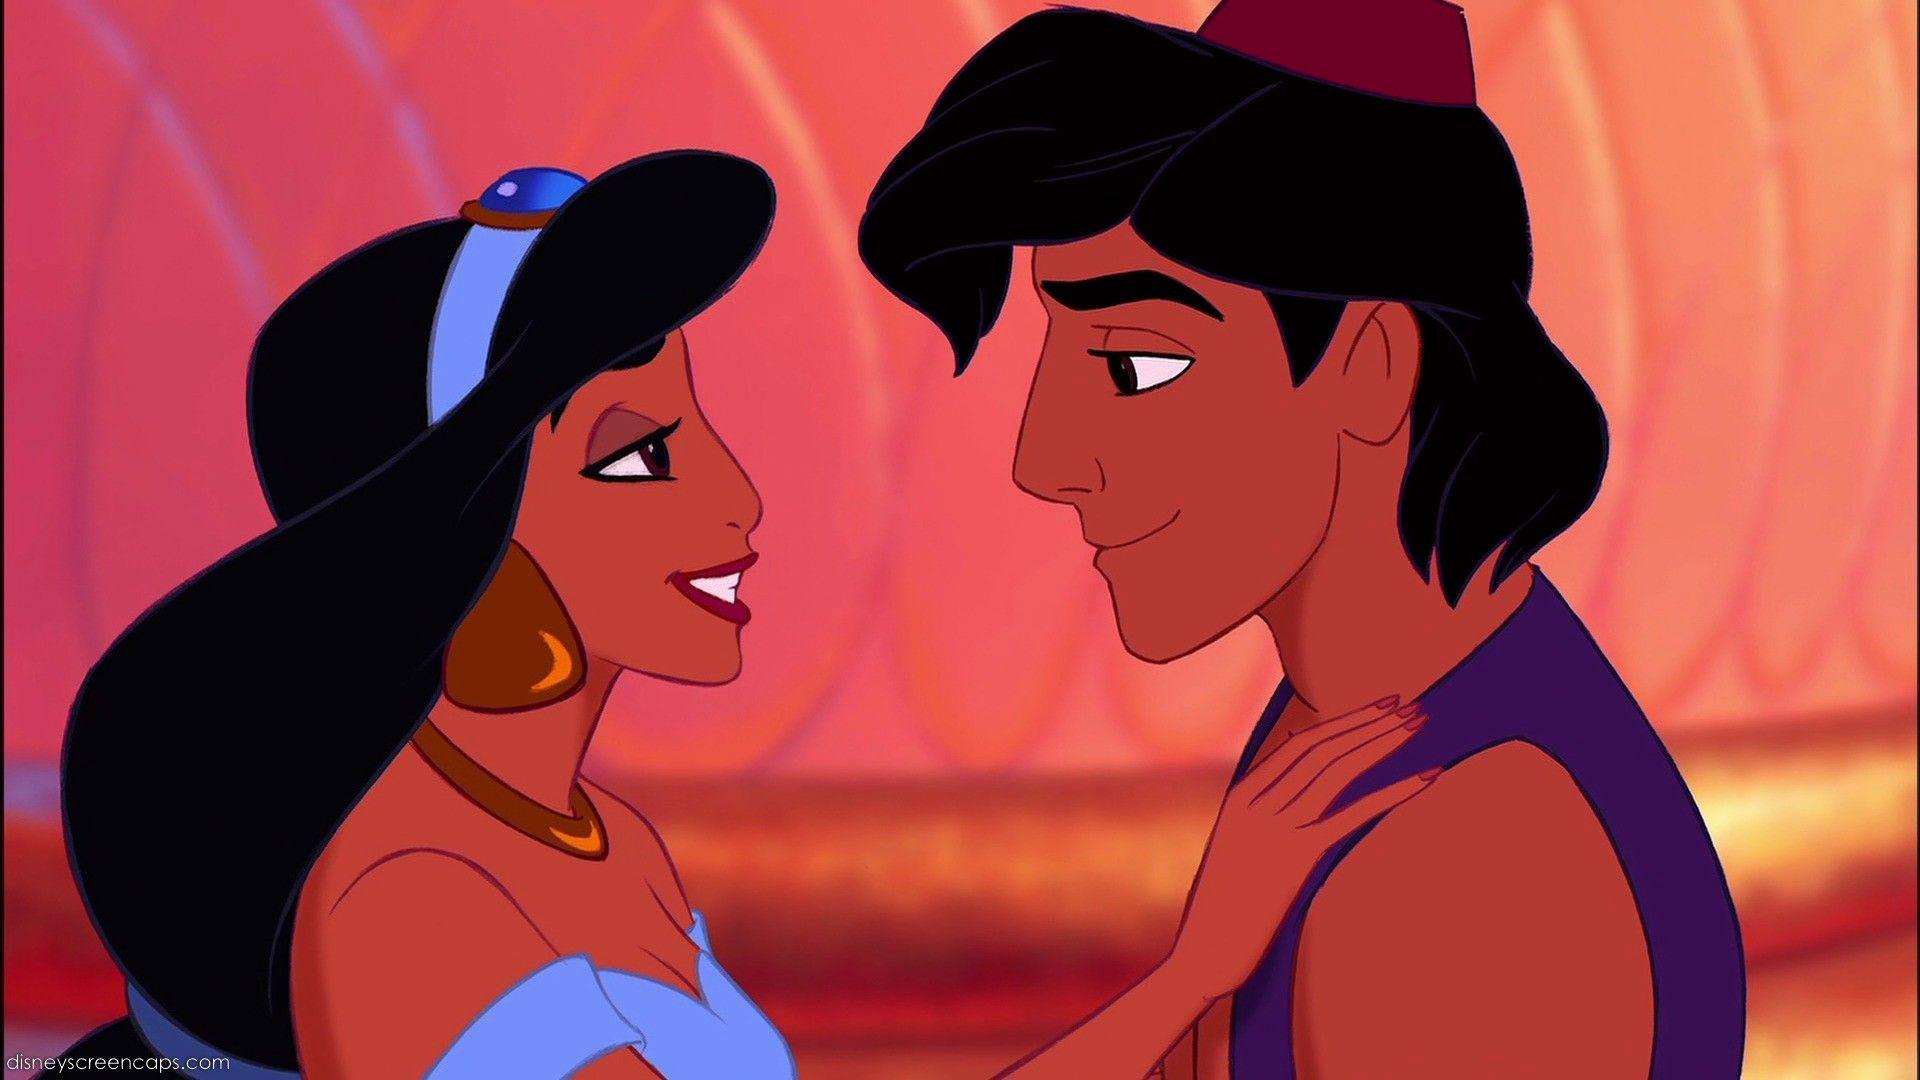 Disney's Aladdin (1992)